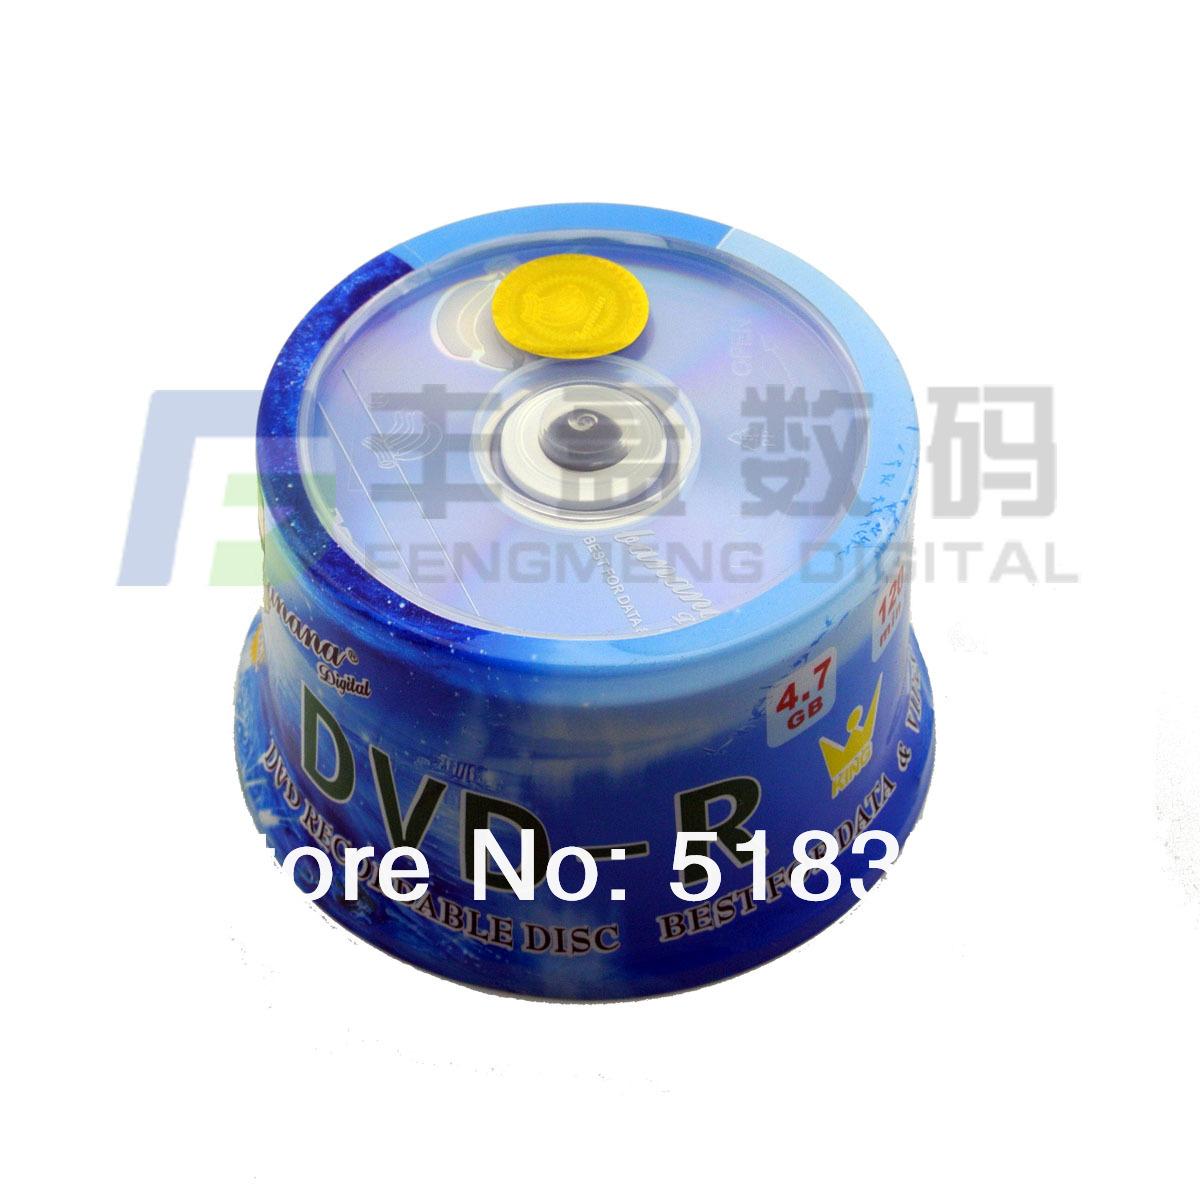 New Arriving Dvd Discs 16X Blank Dvd 4.7G Bottled 50 Pcs Dvd Cd R Dvd-R Dvd Media Fitness(China (Mainland))